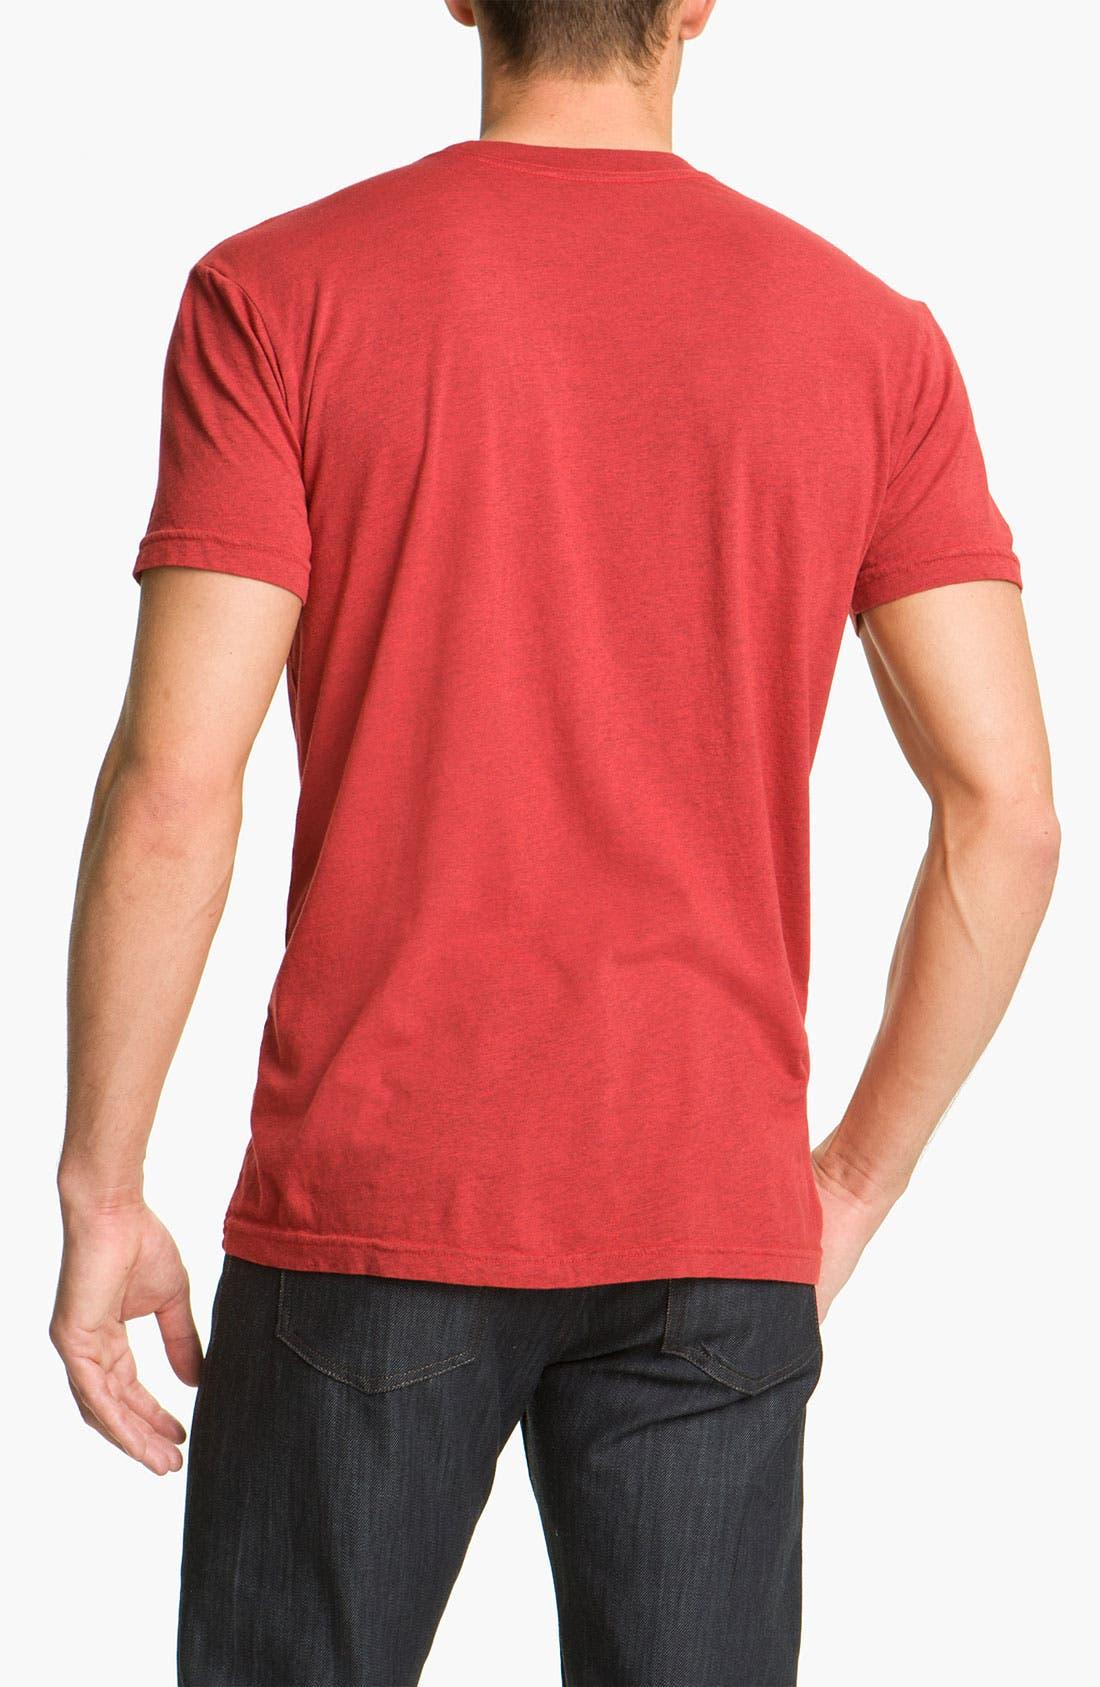 Alternate Image 2  - Quiksilver 'Lead Pill' Slim Fit T-Shirt